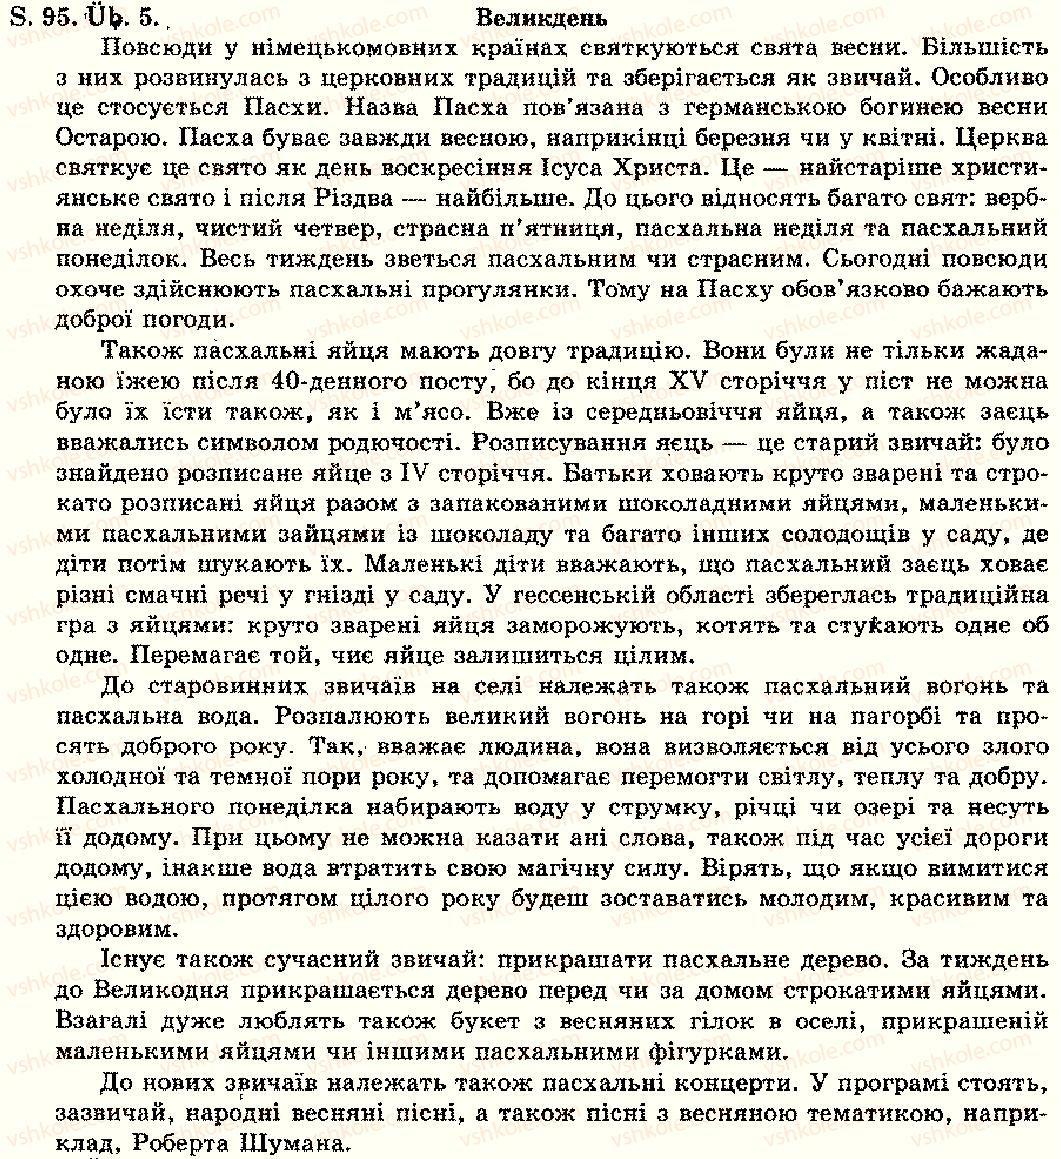 10-nimetska-mova-np-basaj-2006--feste-und-bruche-stunden-1-10-S.95.Üb.5.jpg